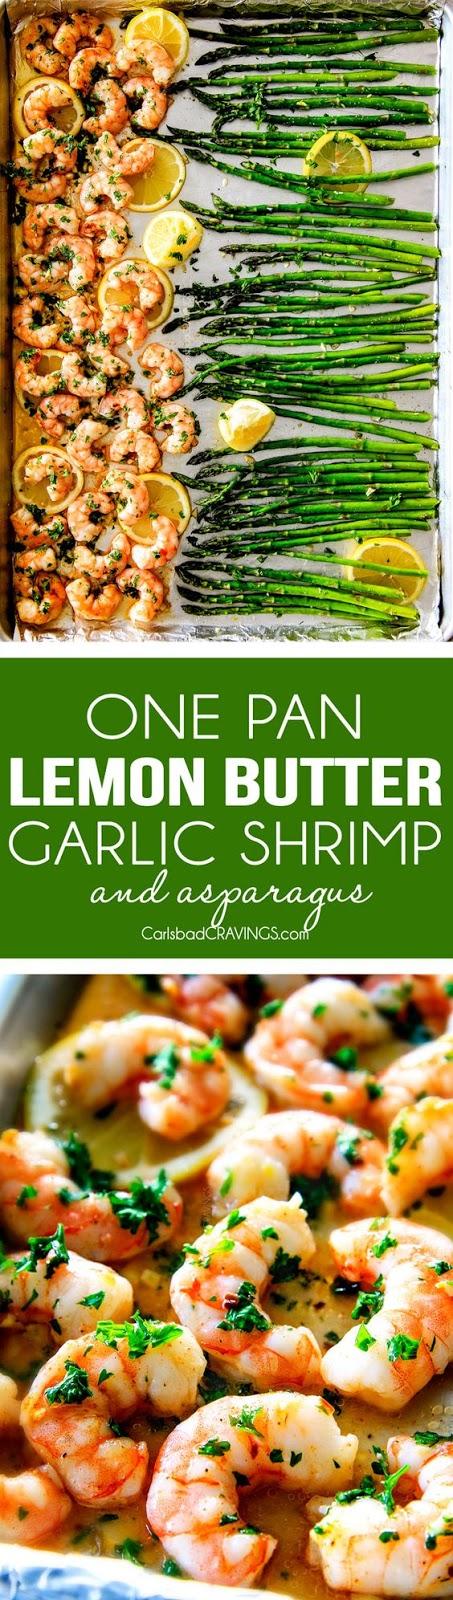 Roasted Lemon Garlic Butter Shrimp and Asparagus